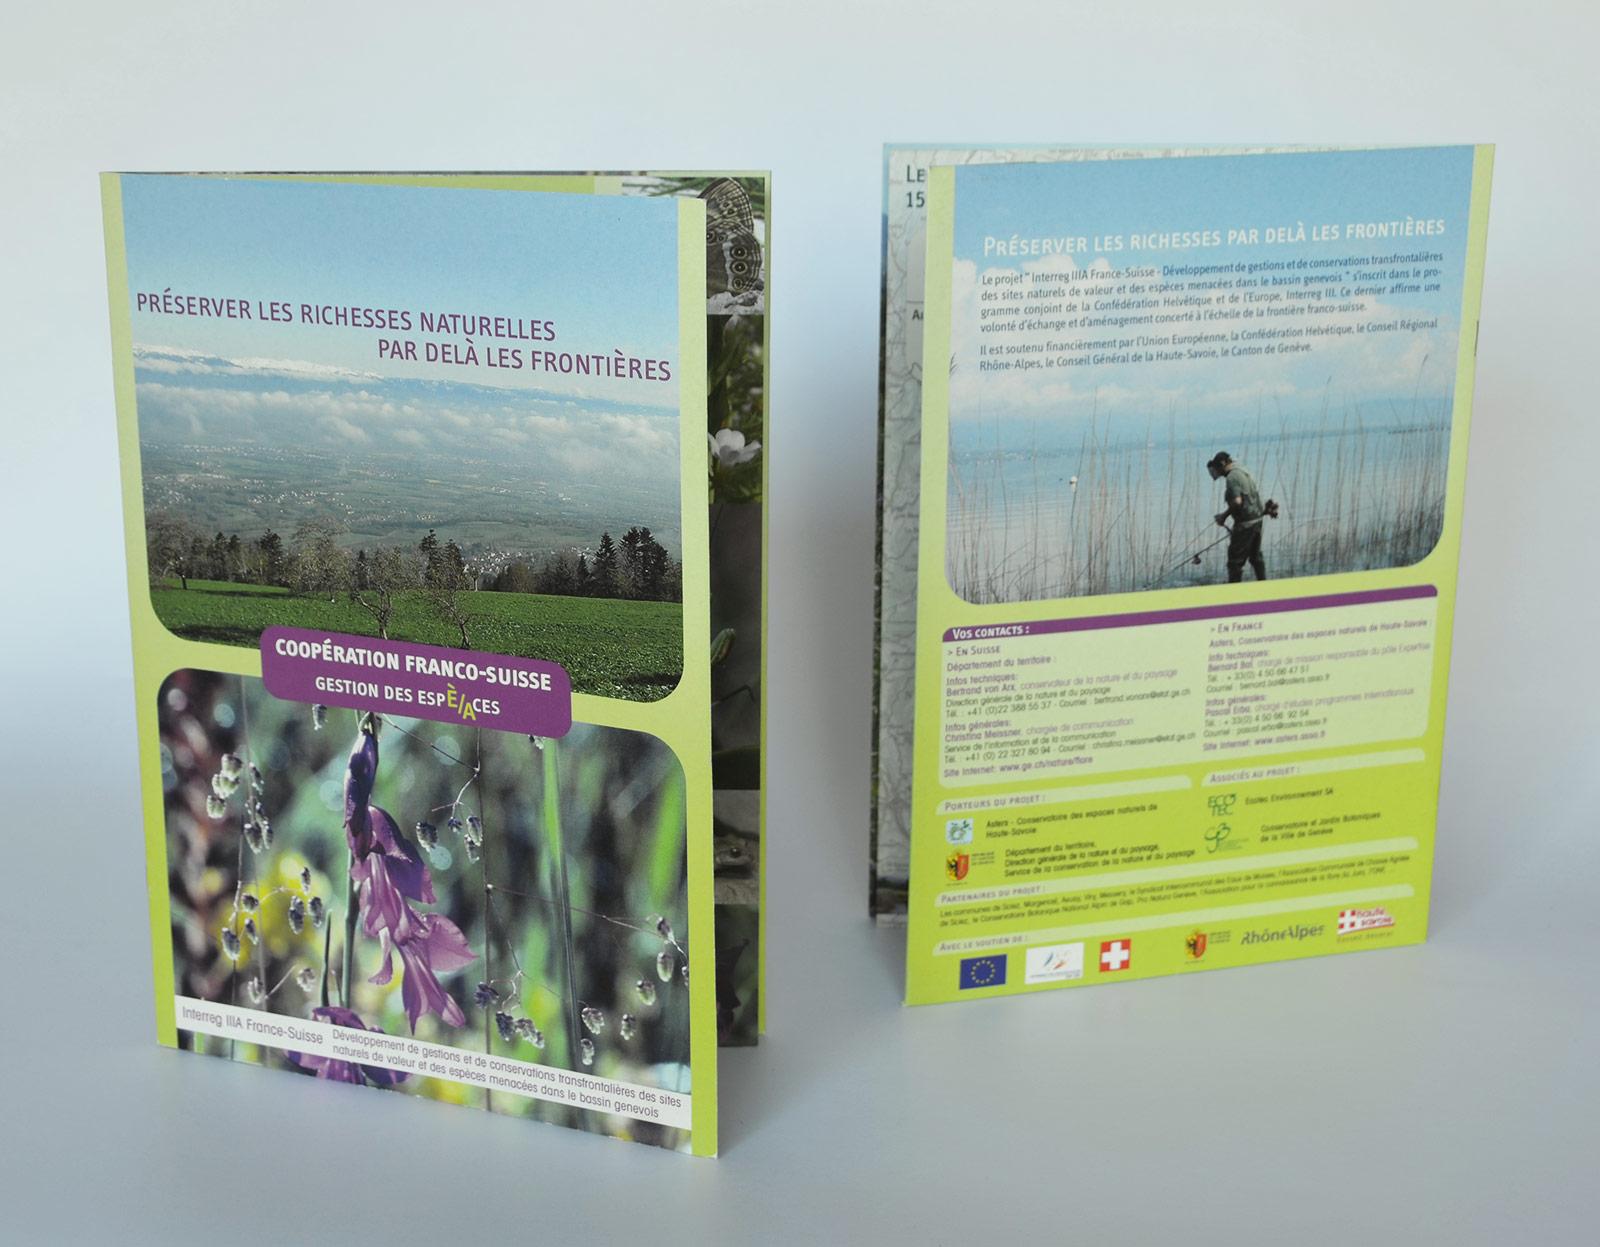 Brochure-preserver-richesses-naturelles-couv